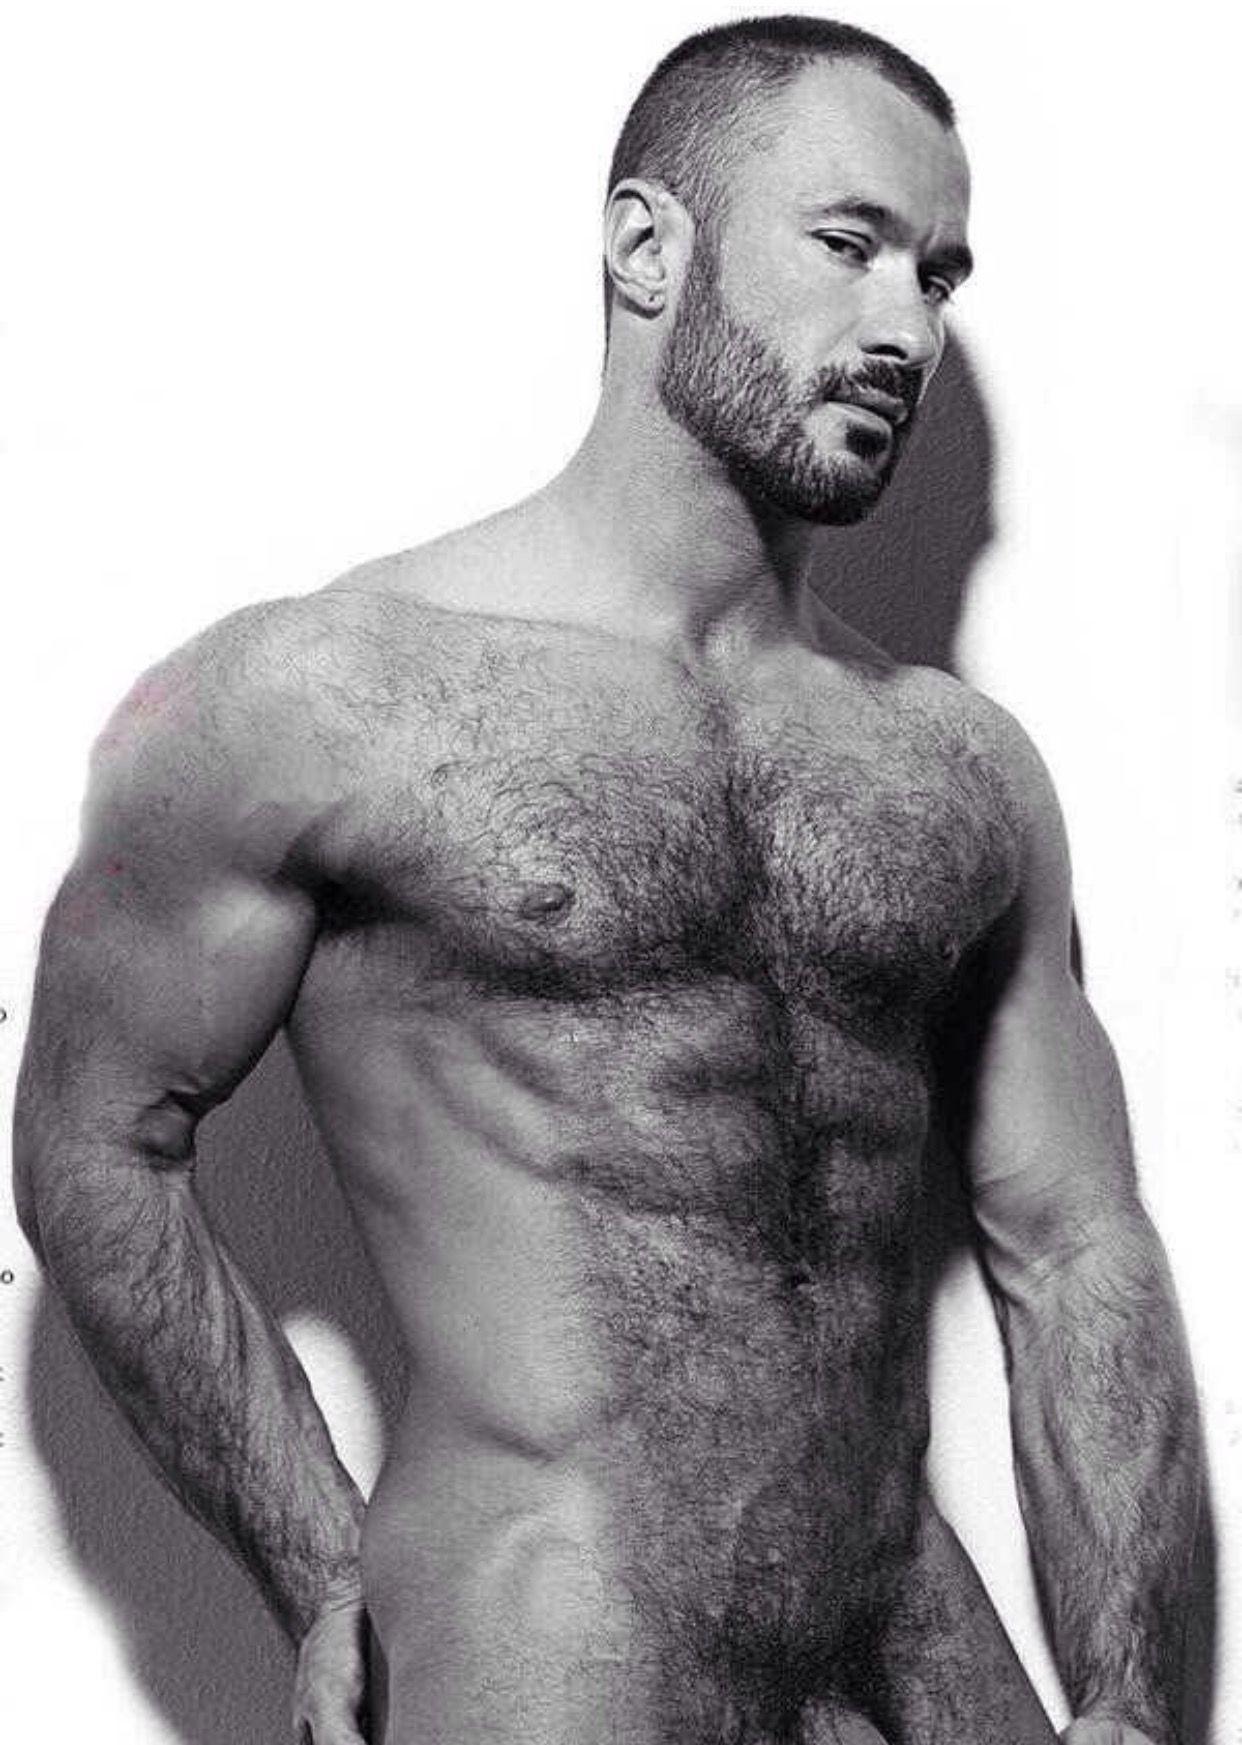 Hombres realmente calientes desnudos